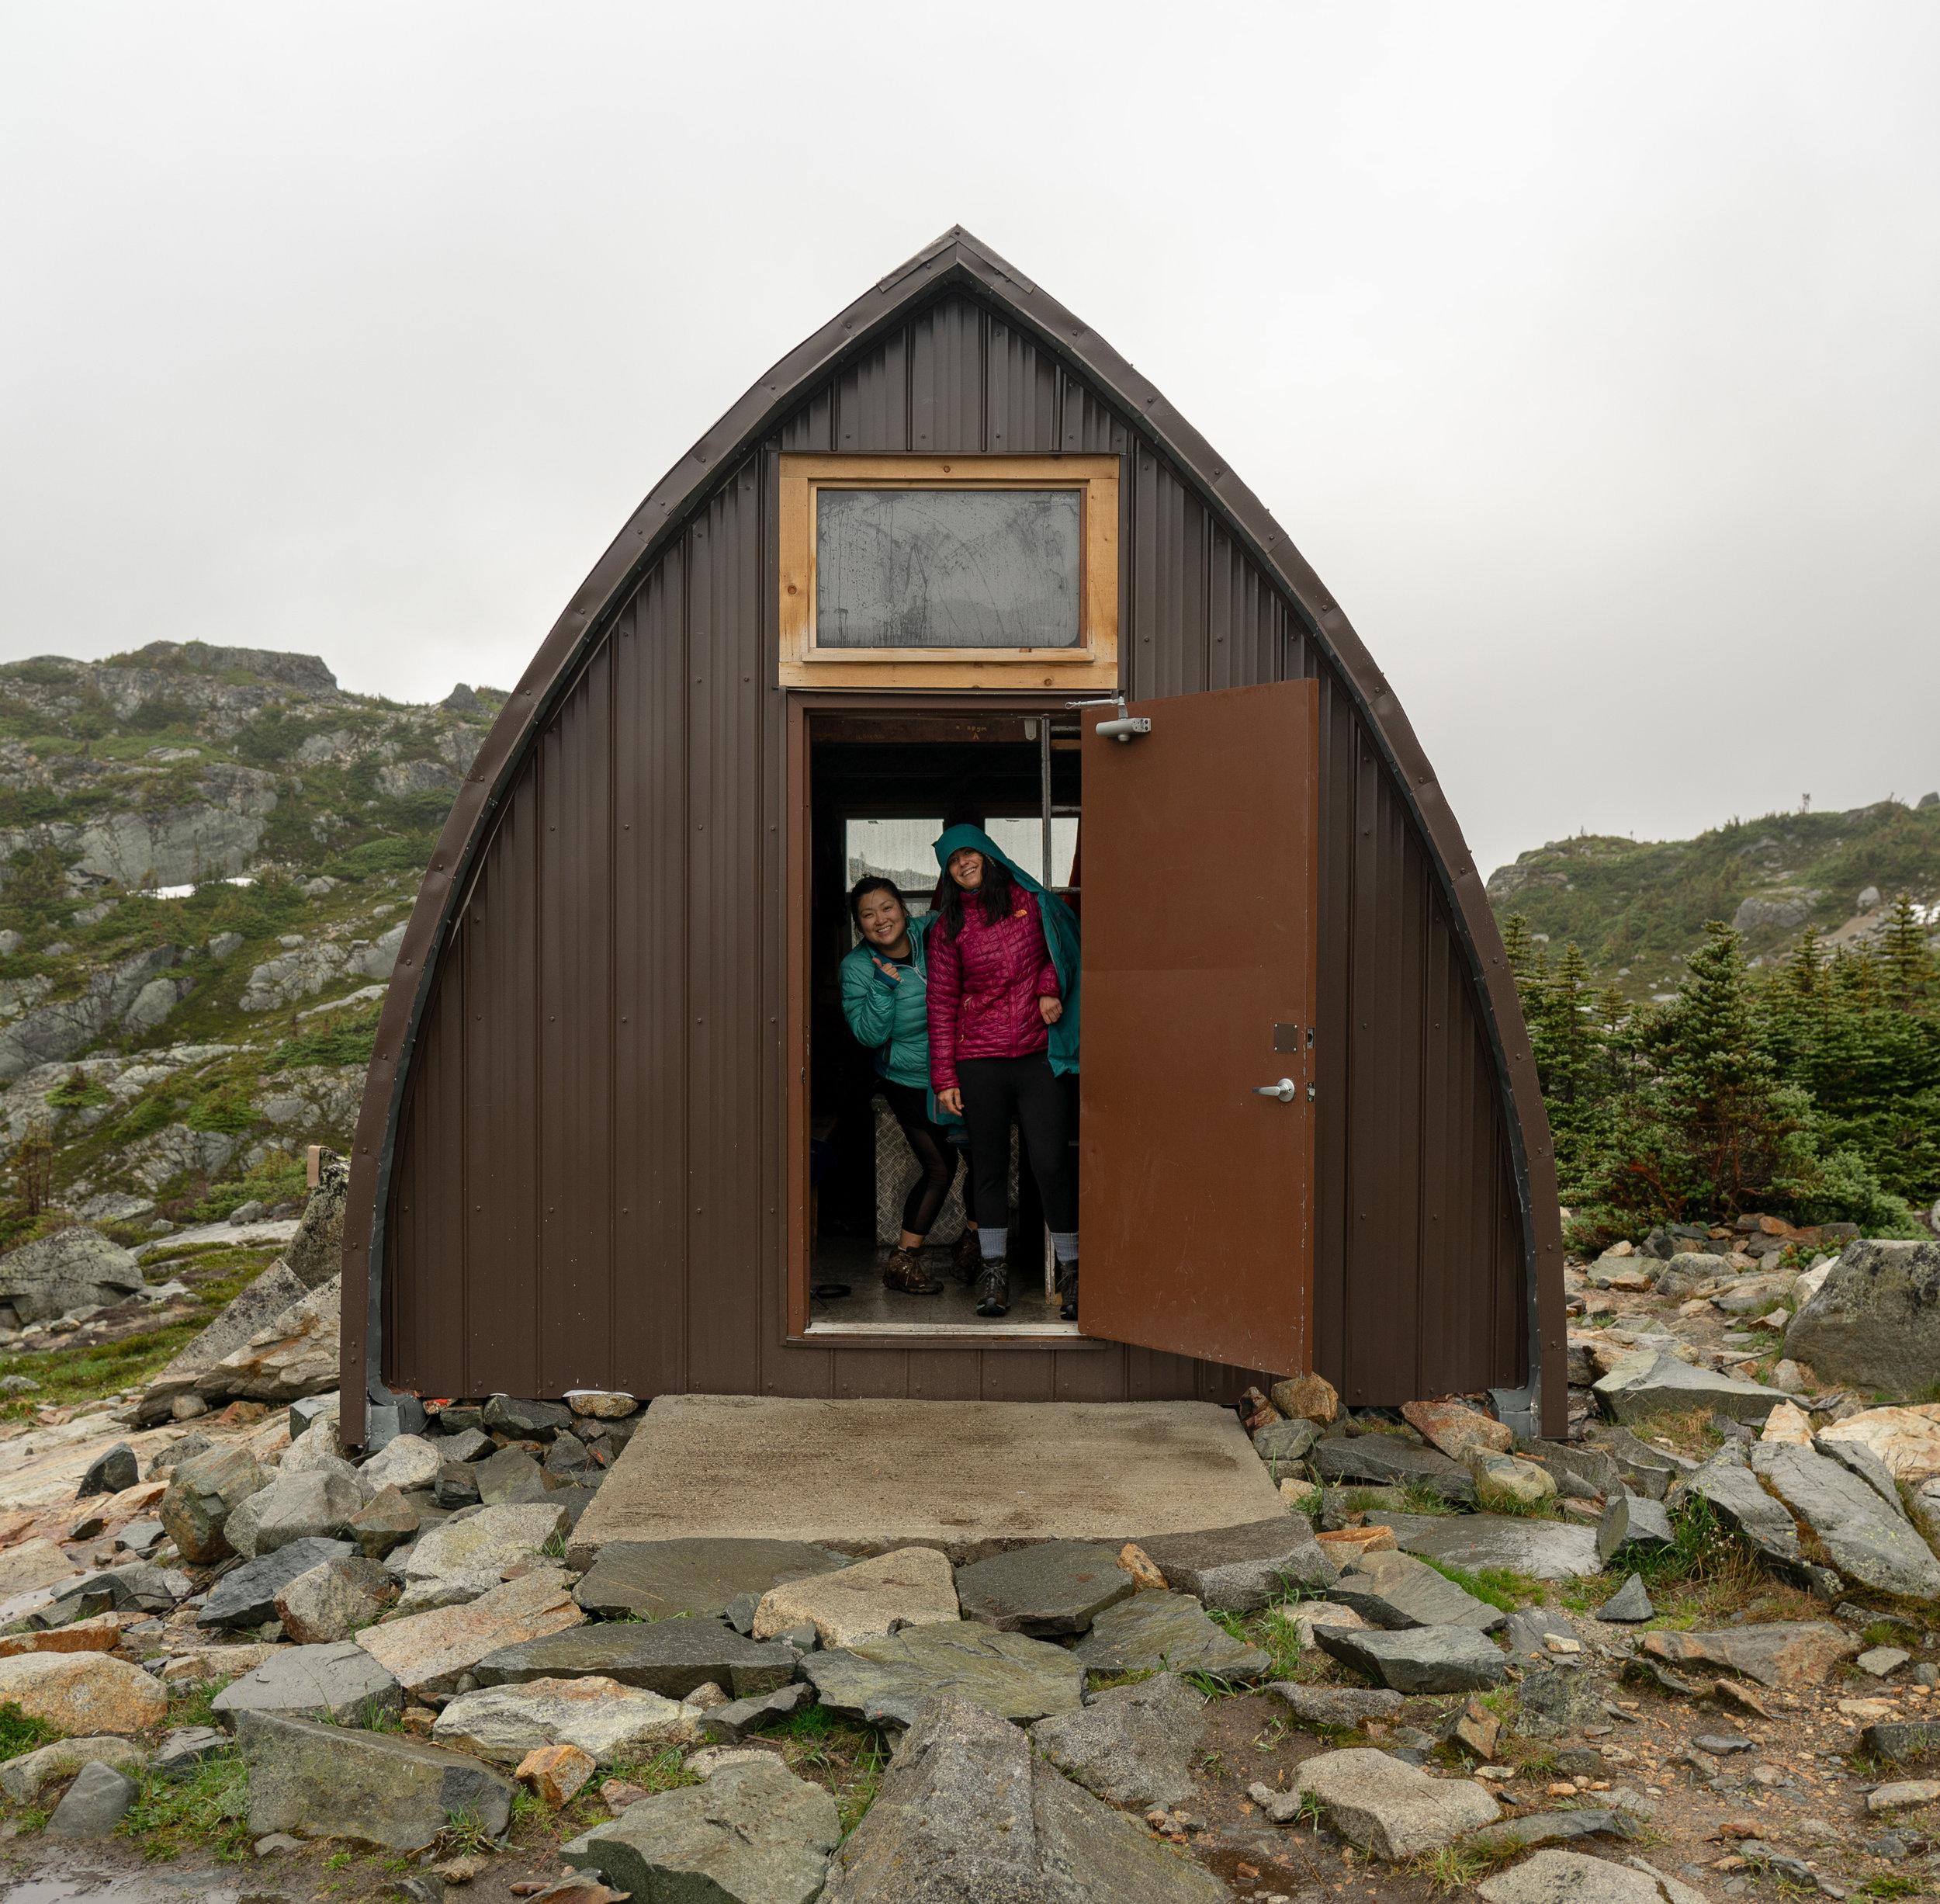 Doris and Katherine in the hut at Wedgemount lake